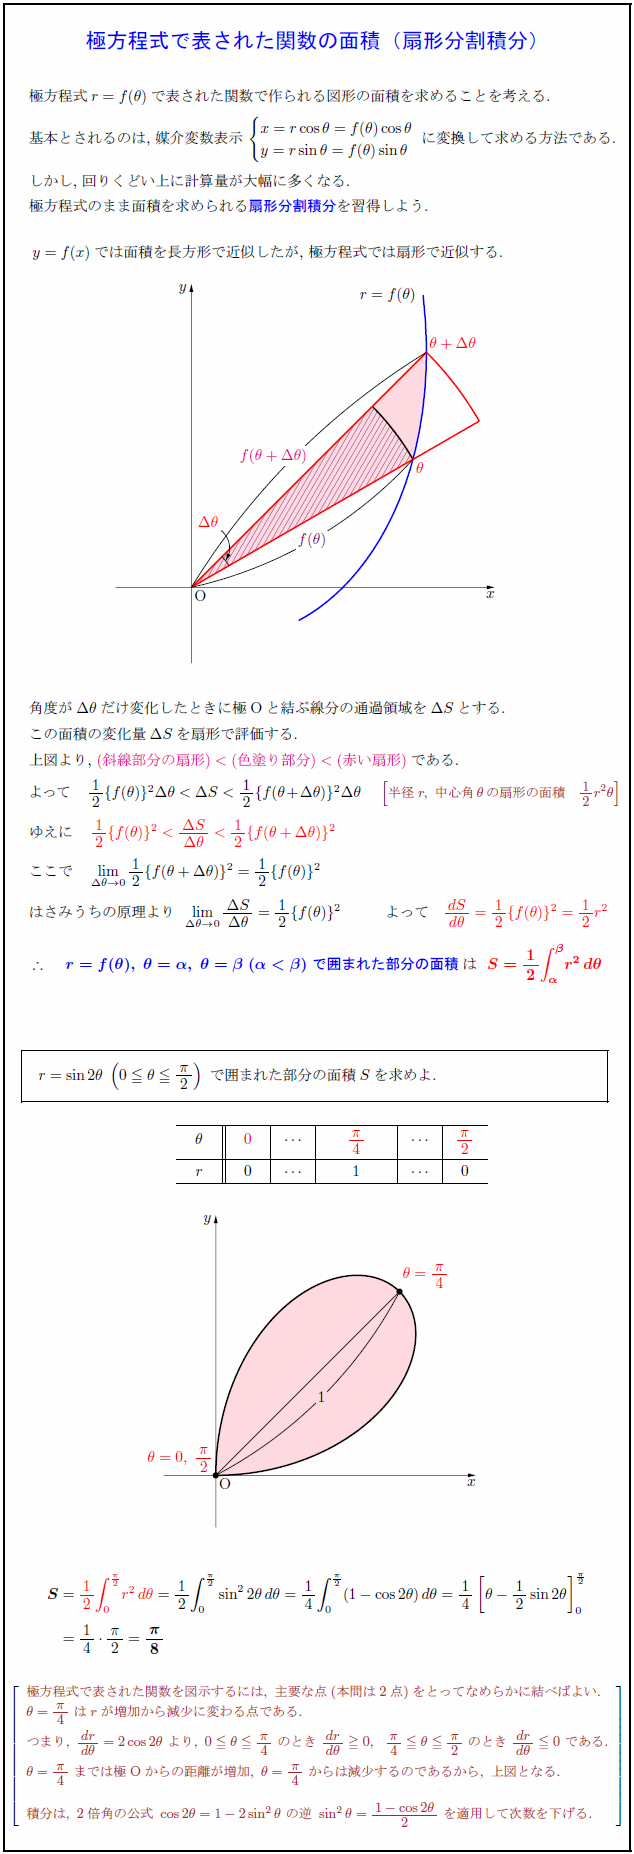 sum-polar-equation